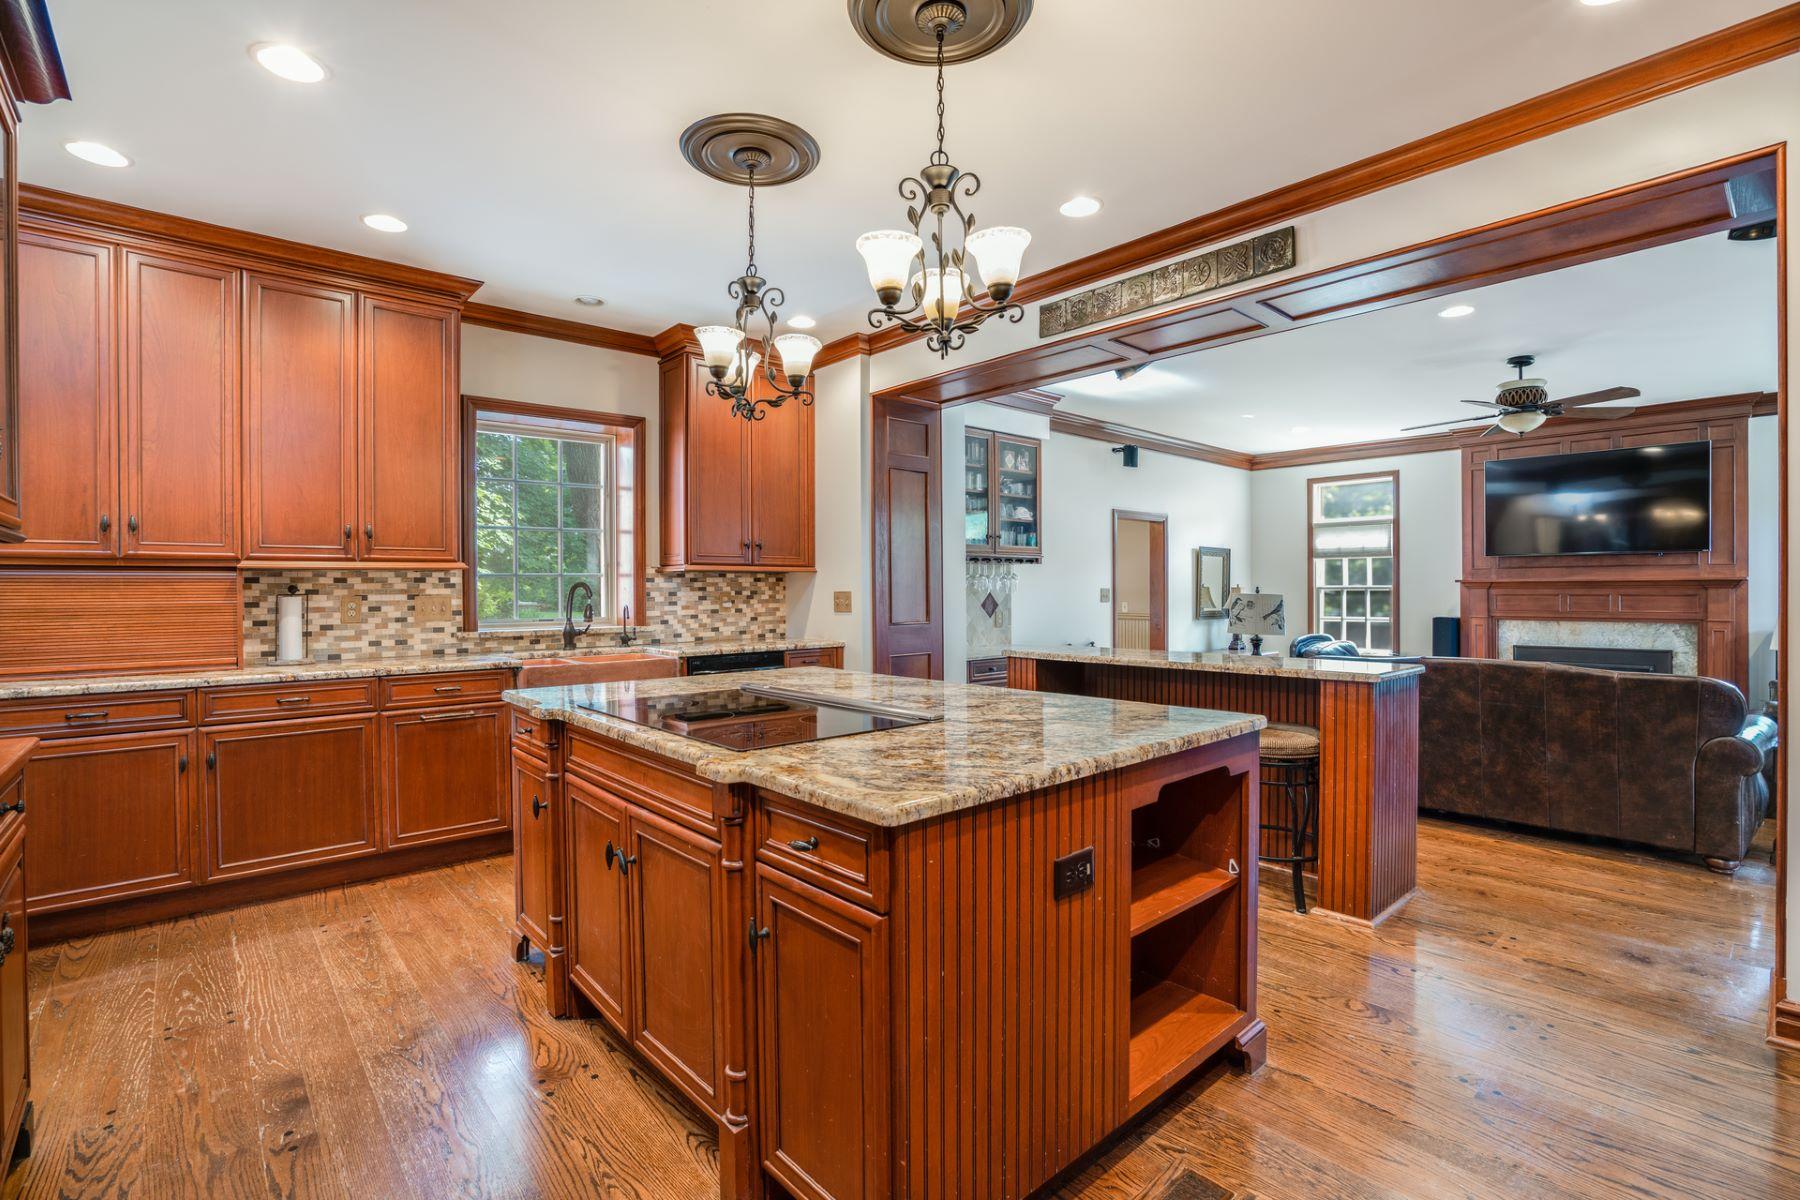 Additional photo for property listing at Charming Spanish Tudor 12 Granada Way Ladue, Missouri 63124 United States